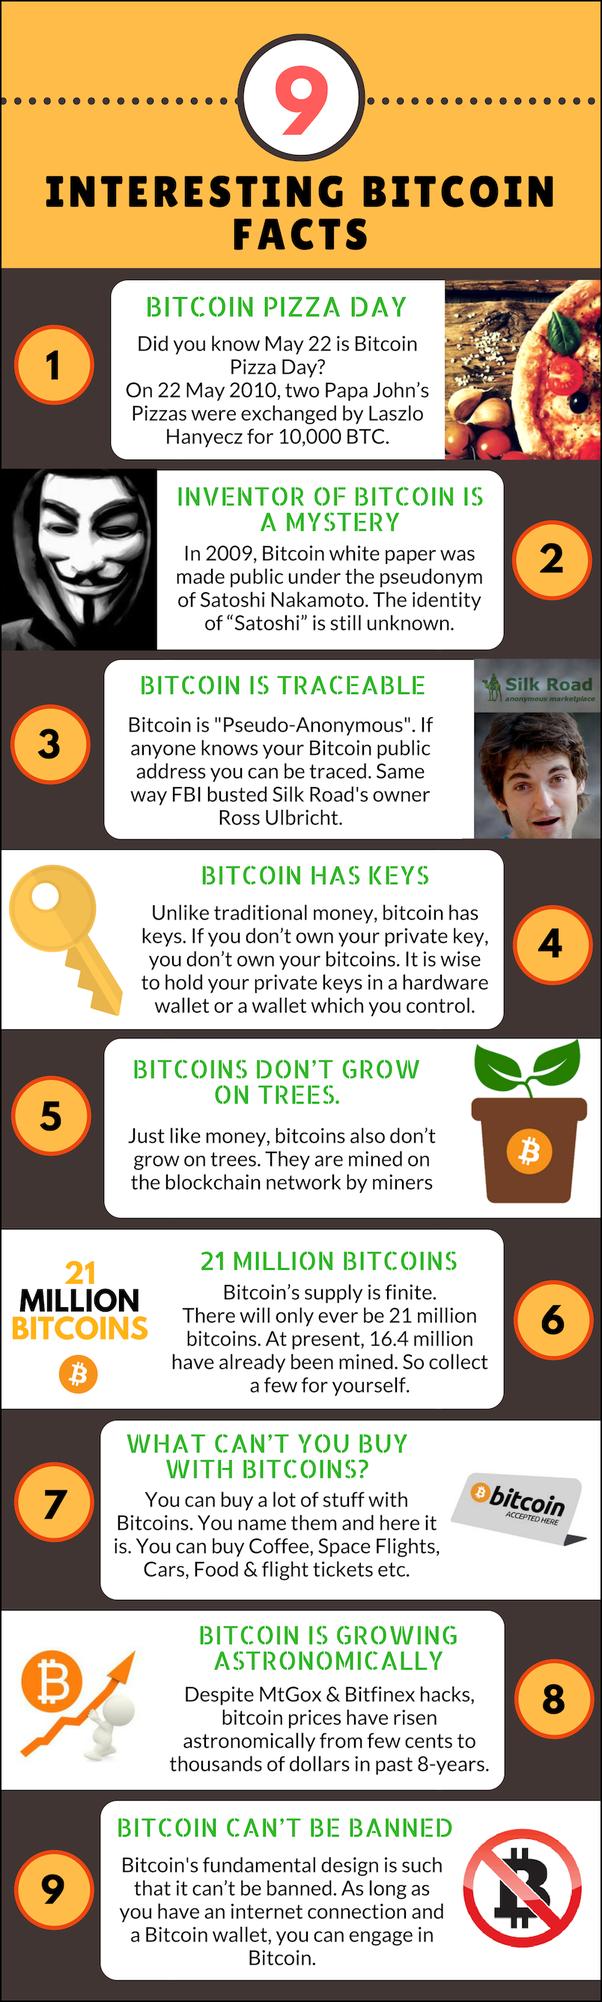 how does your bitcoin grow